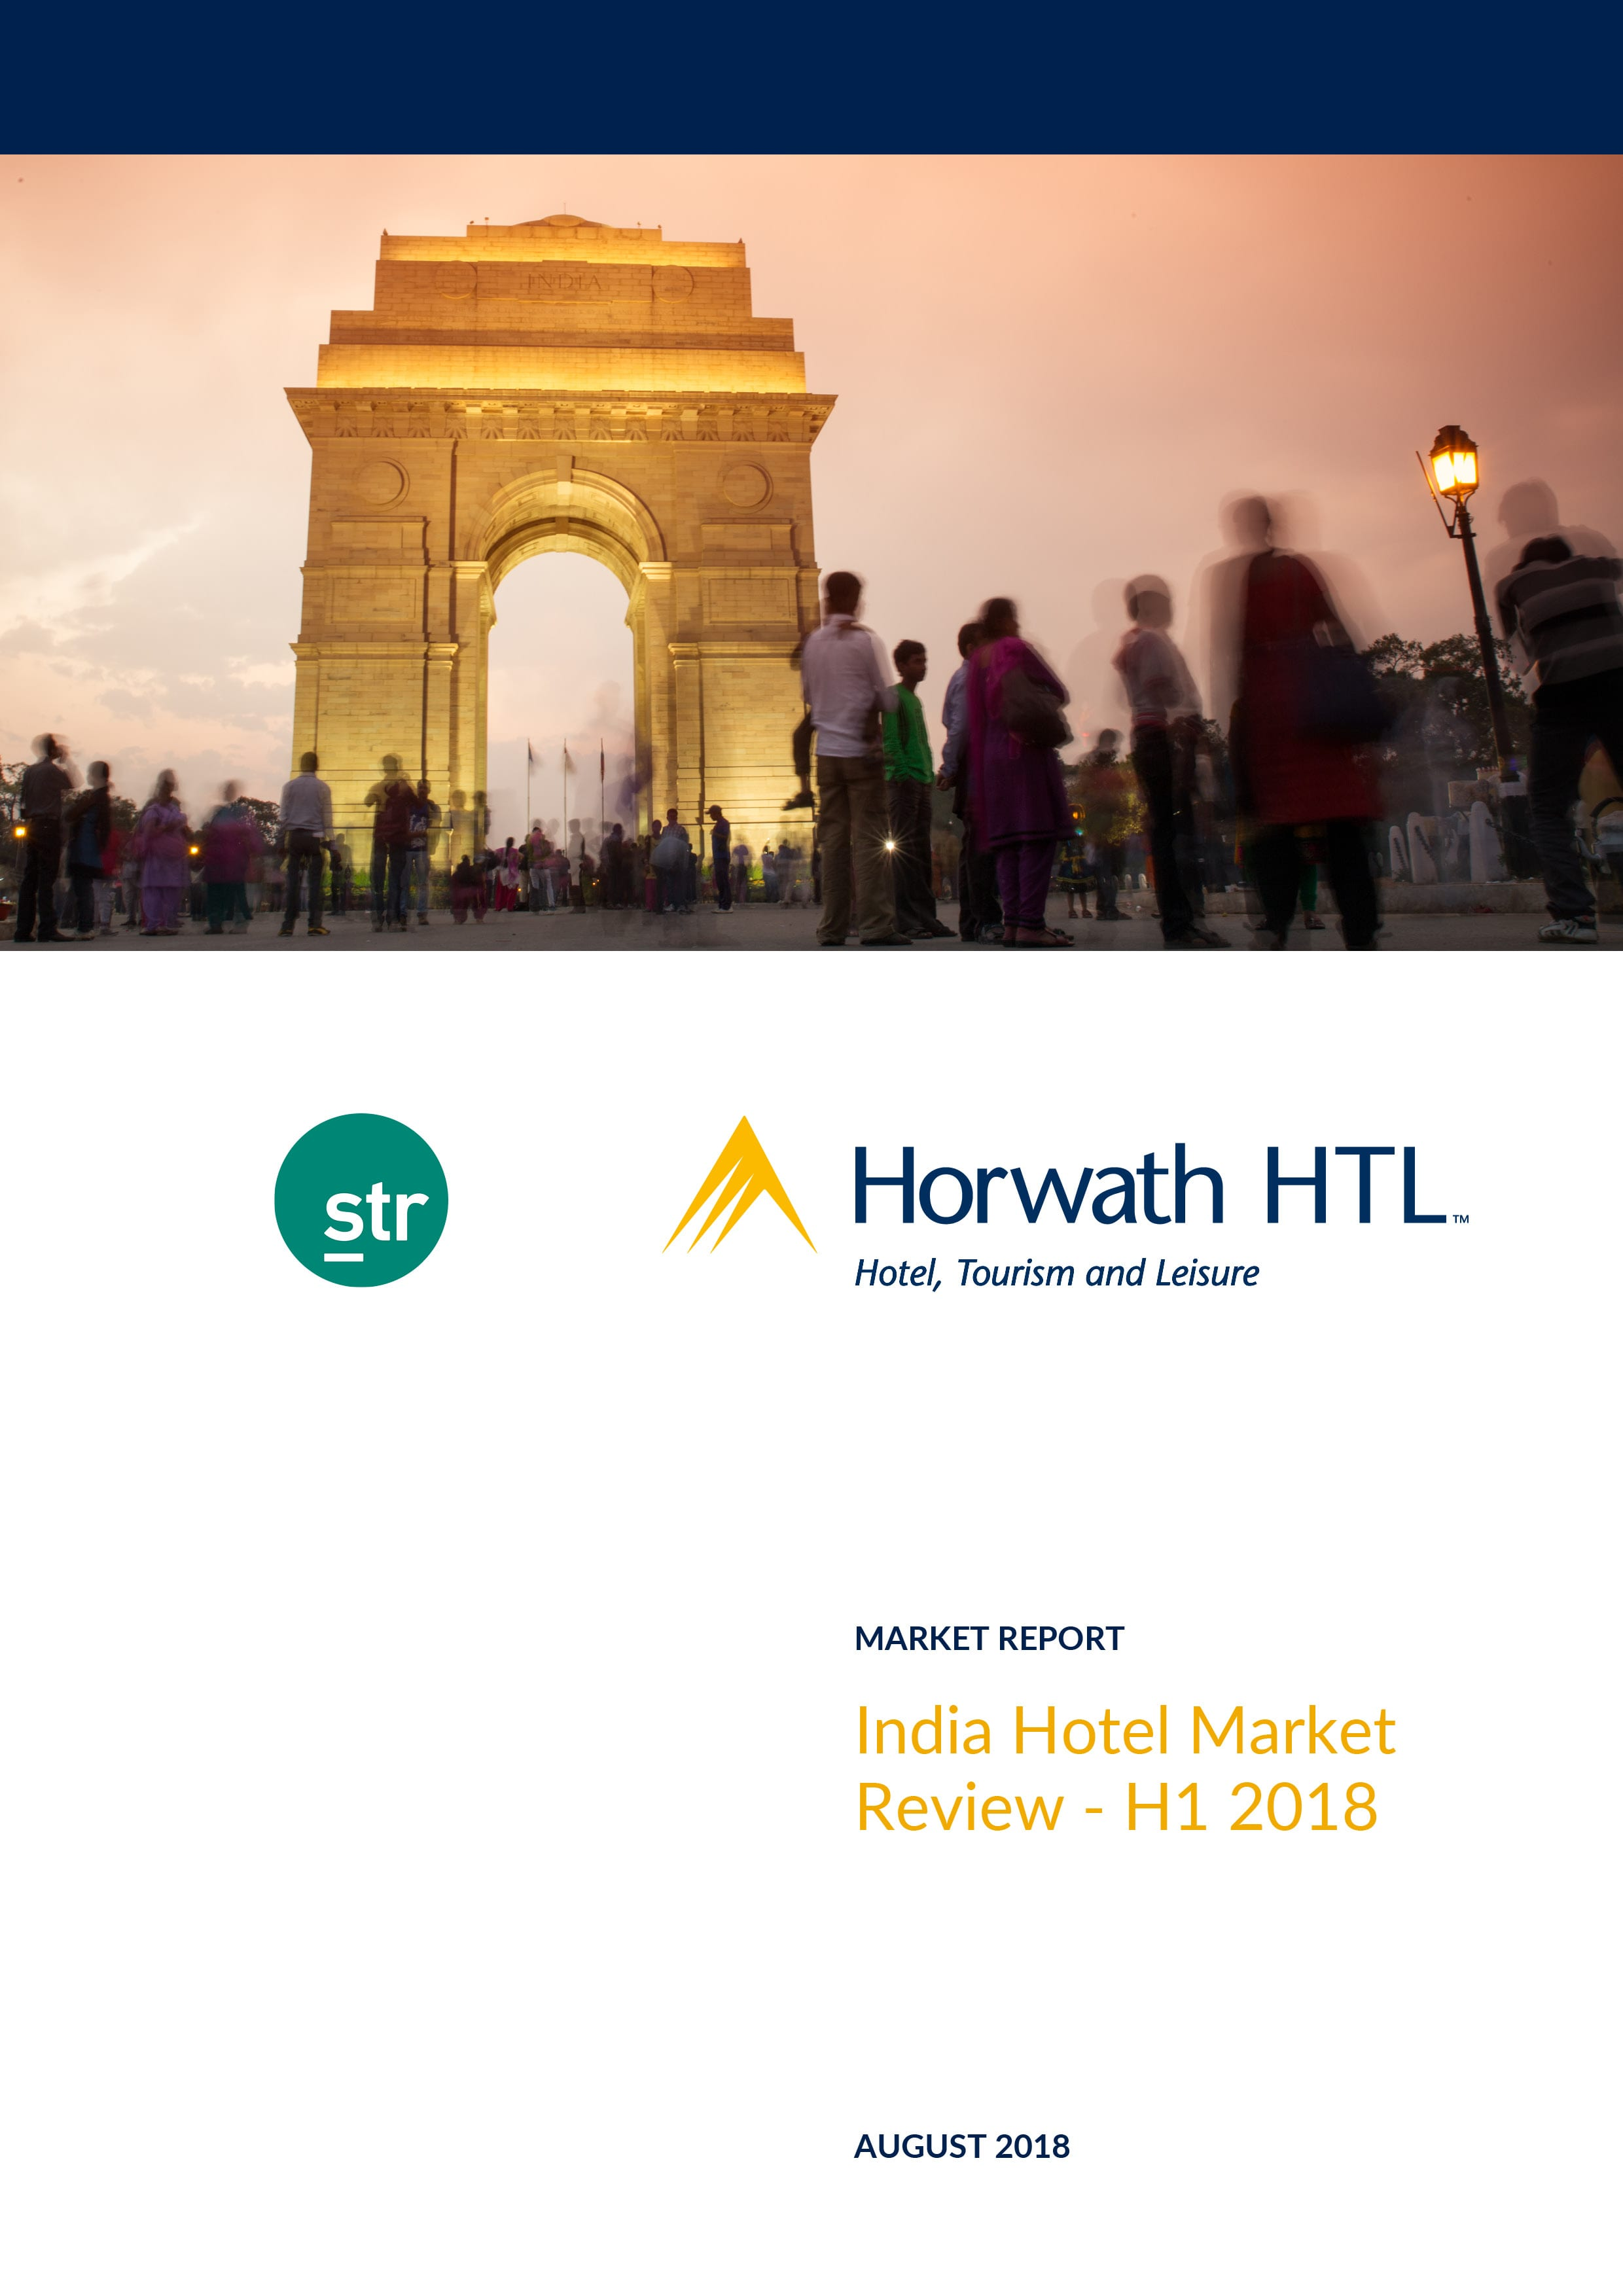 MR India Hotel Market H1 2018